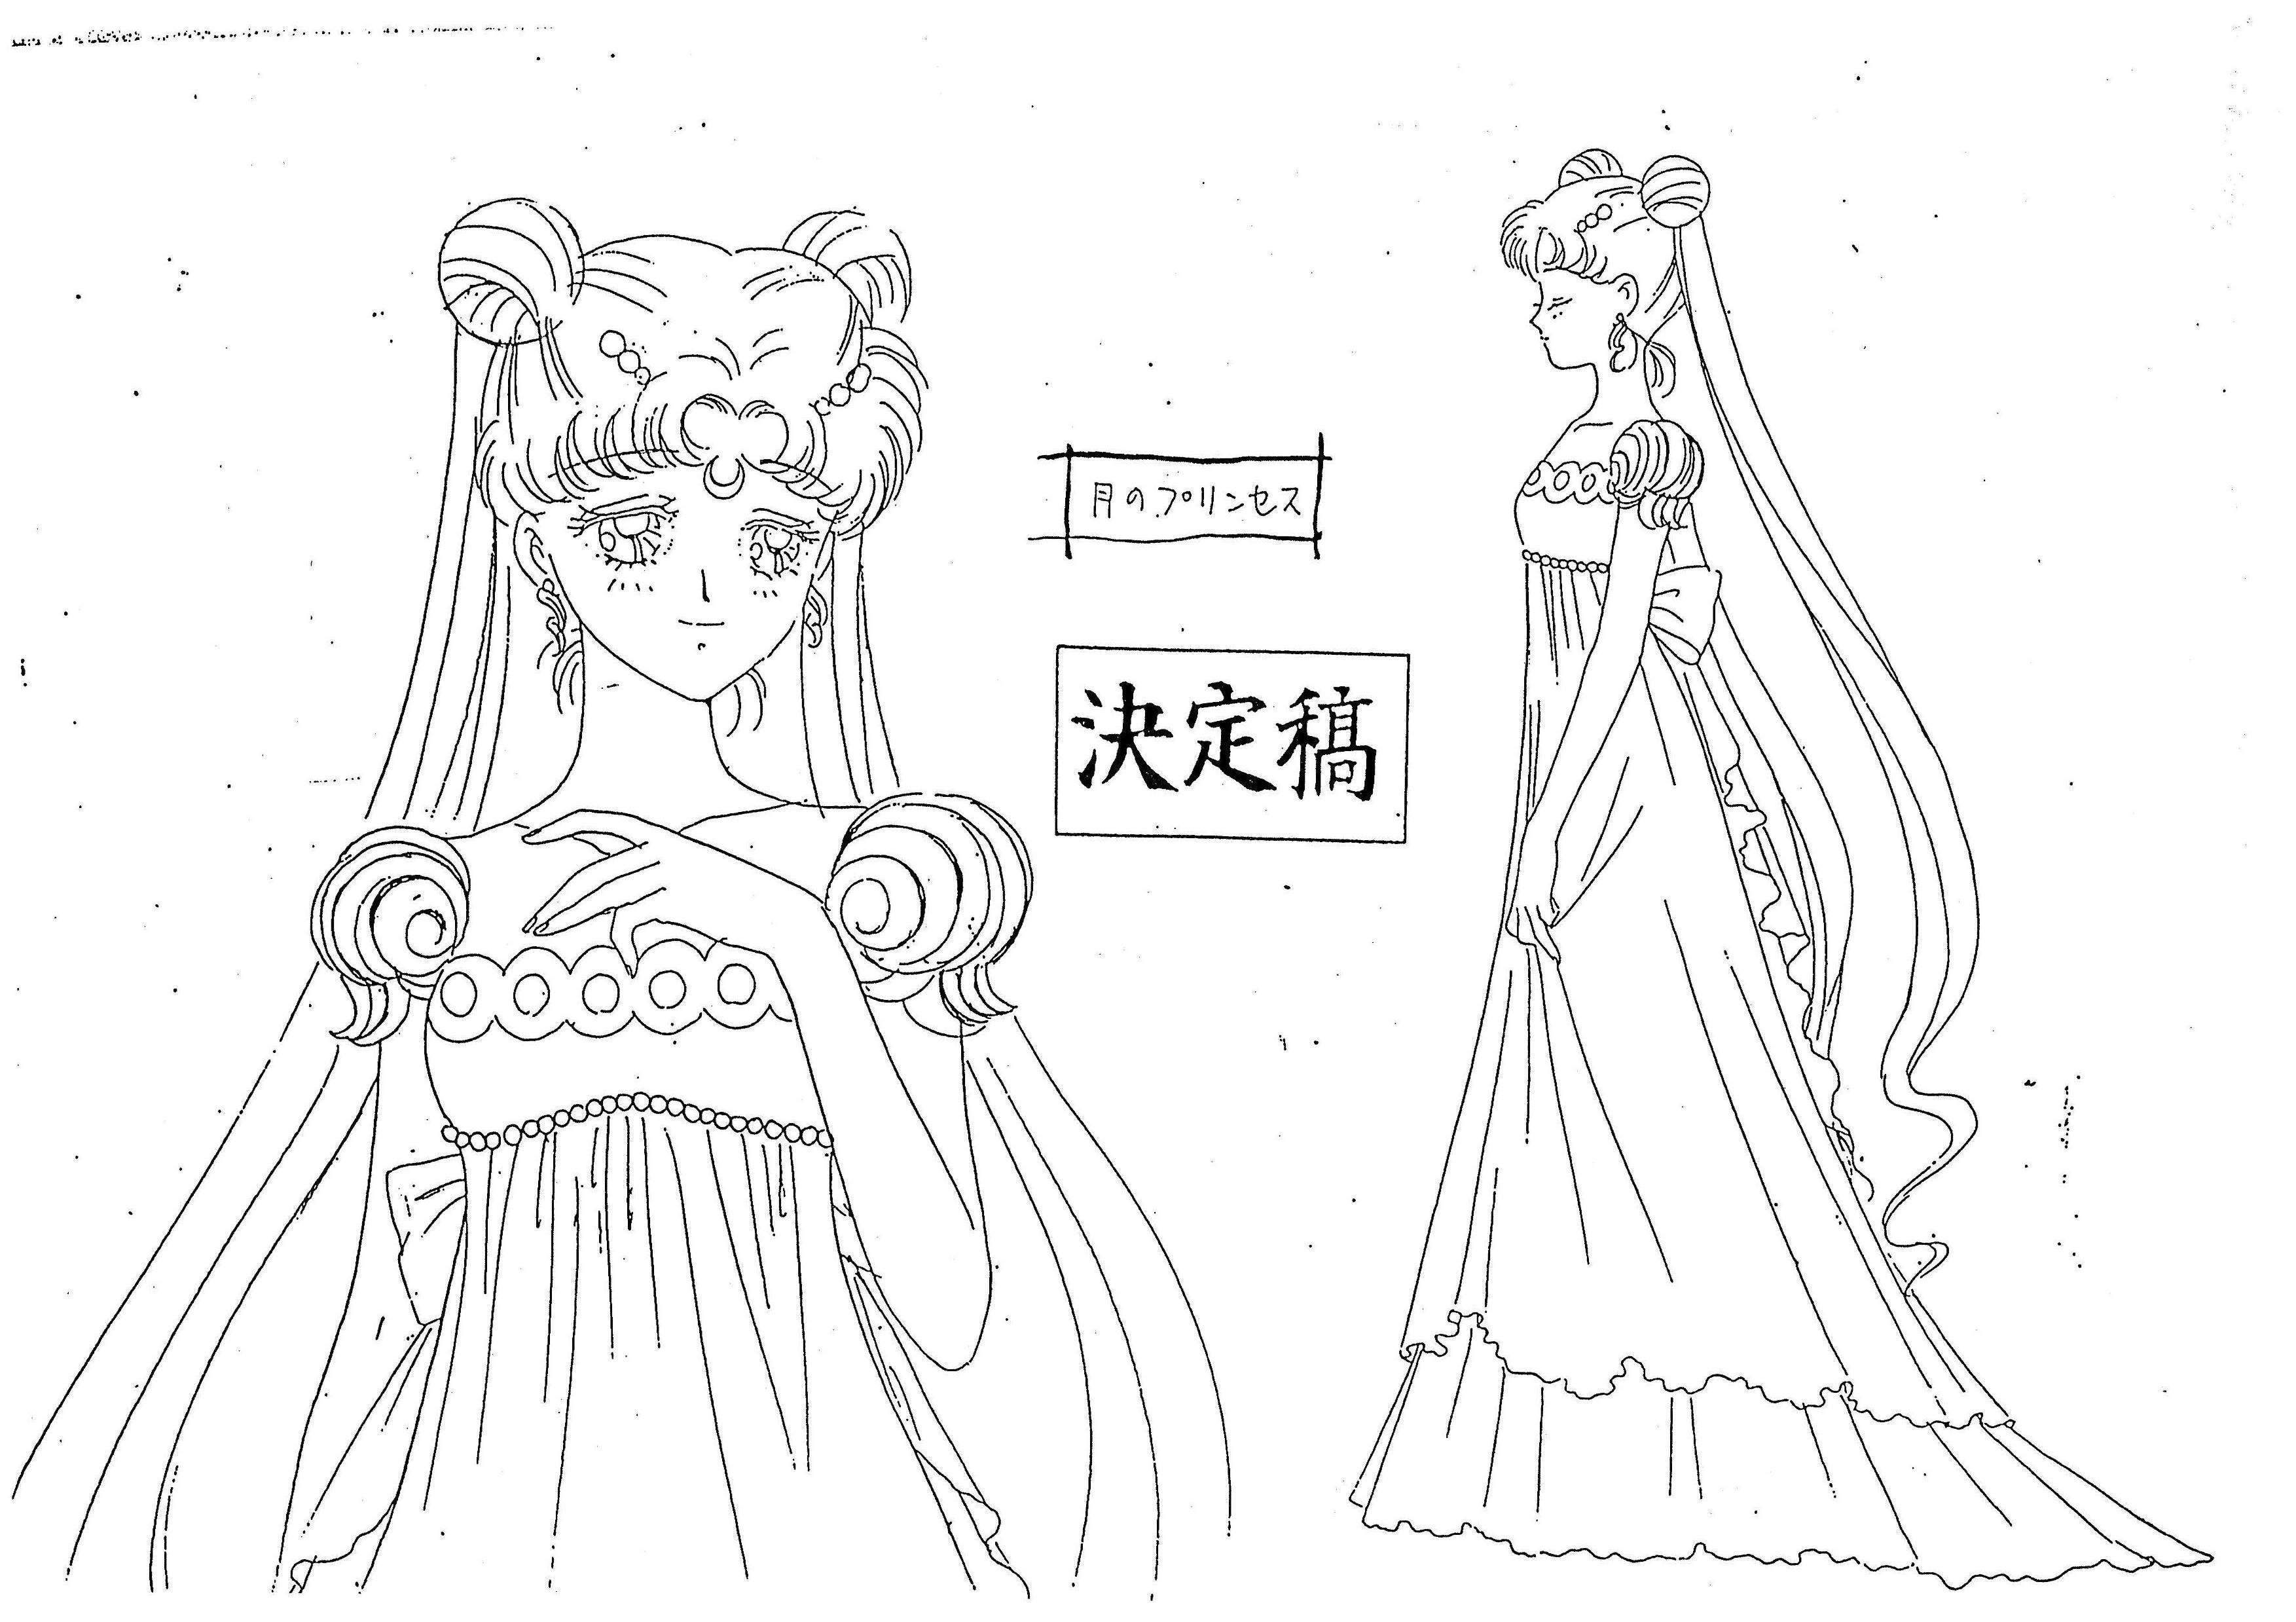 Princess Serenity Model Sheet by chewychomp on DeviantArt